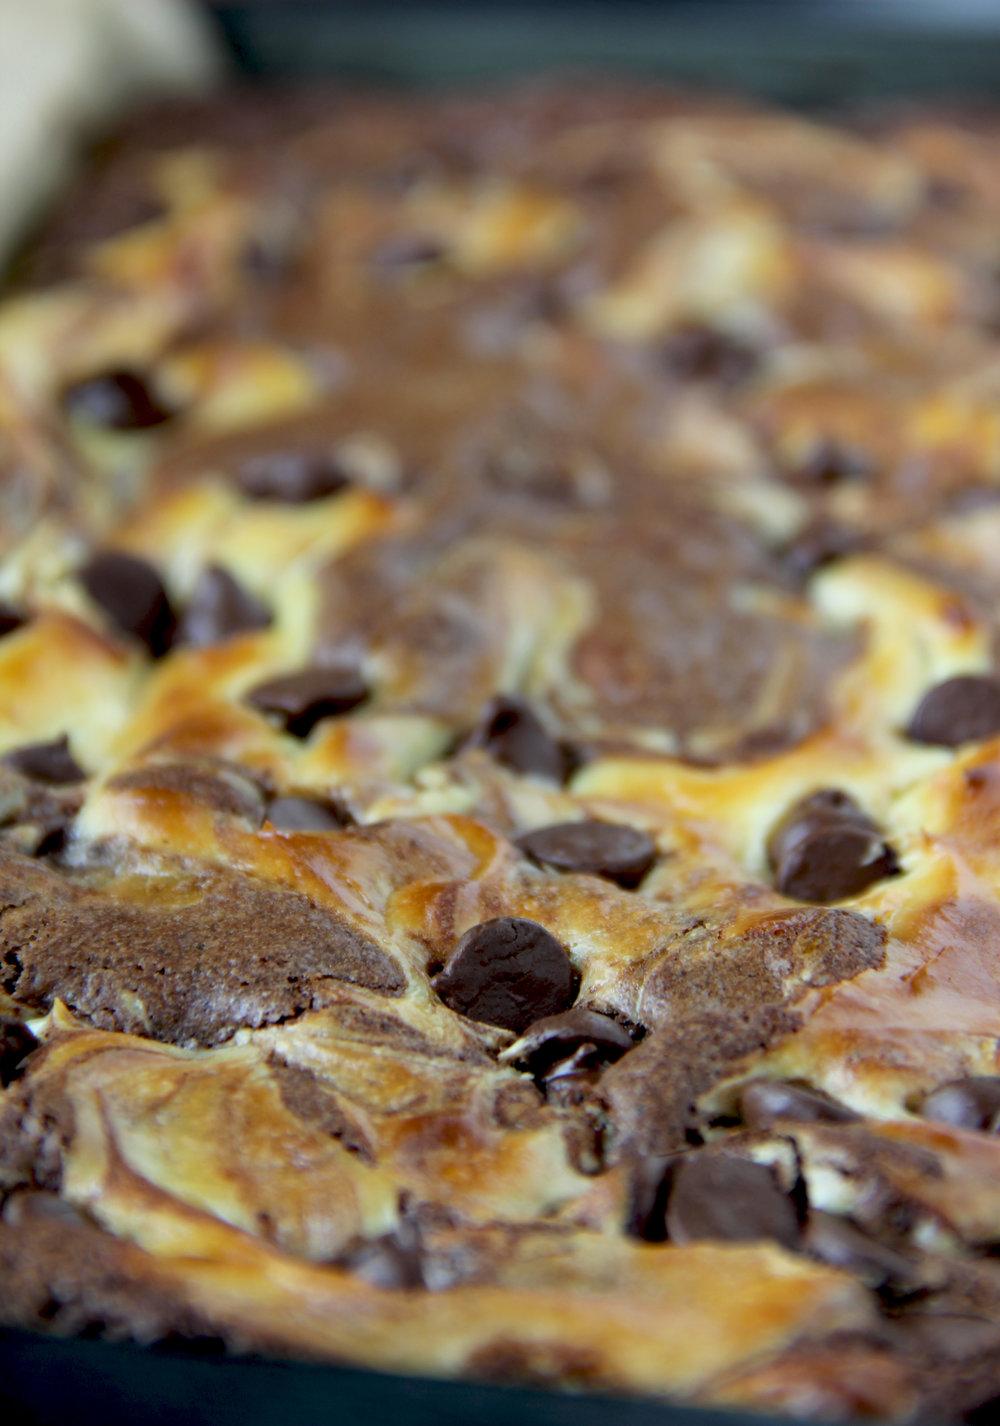 cheesecake b 4.jpg